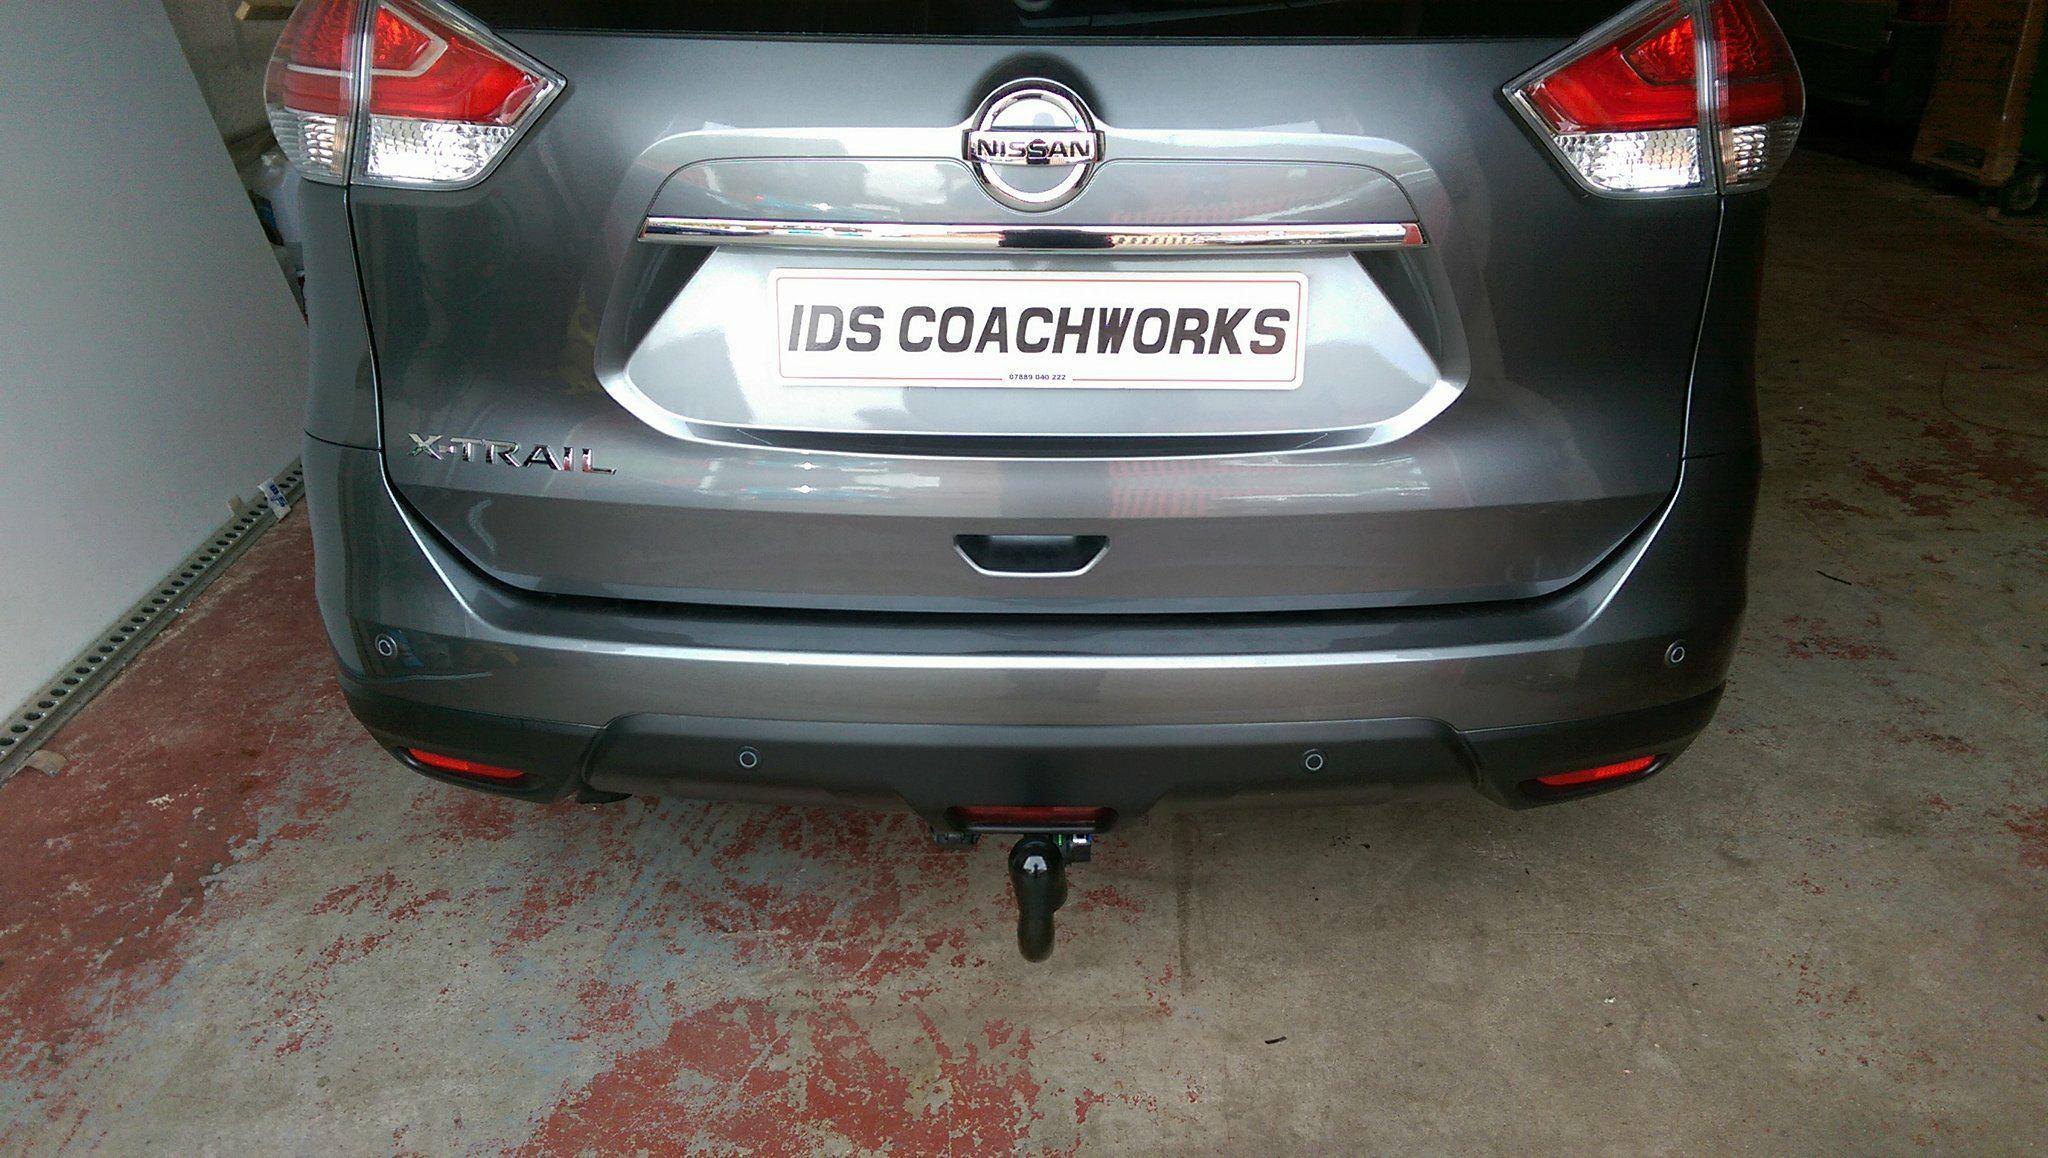 IDS Coachworks